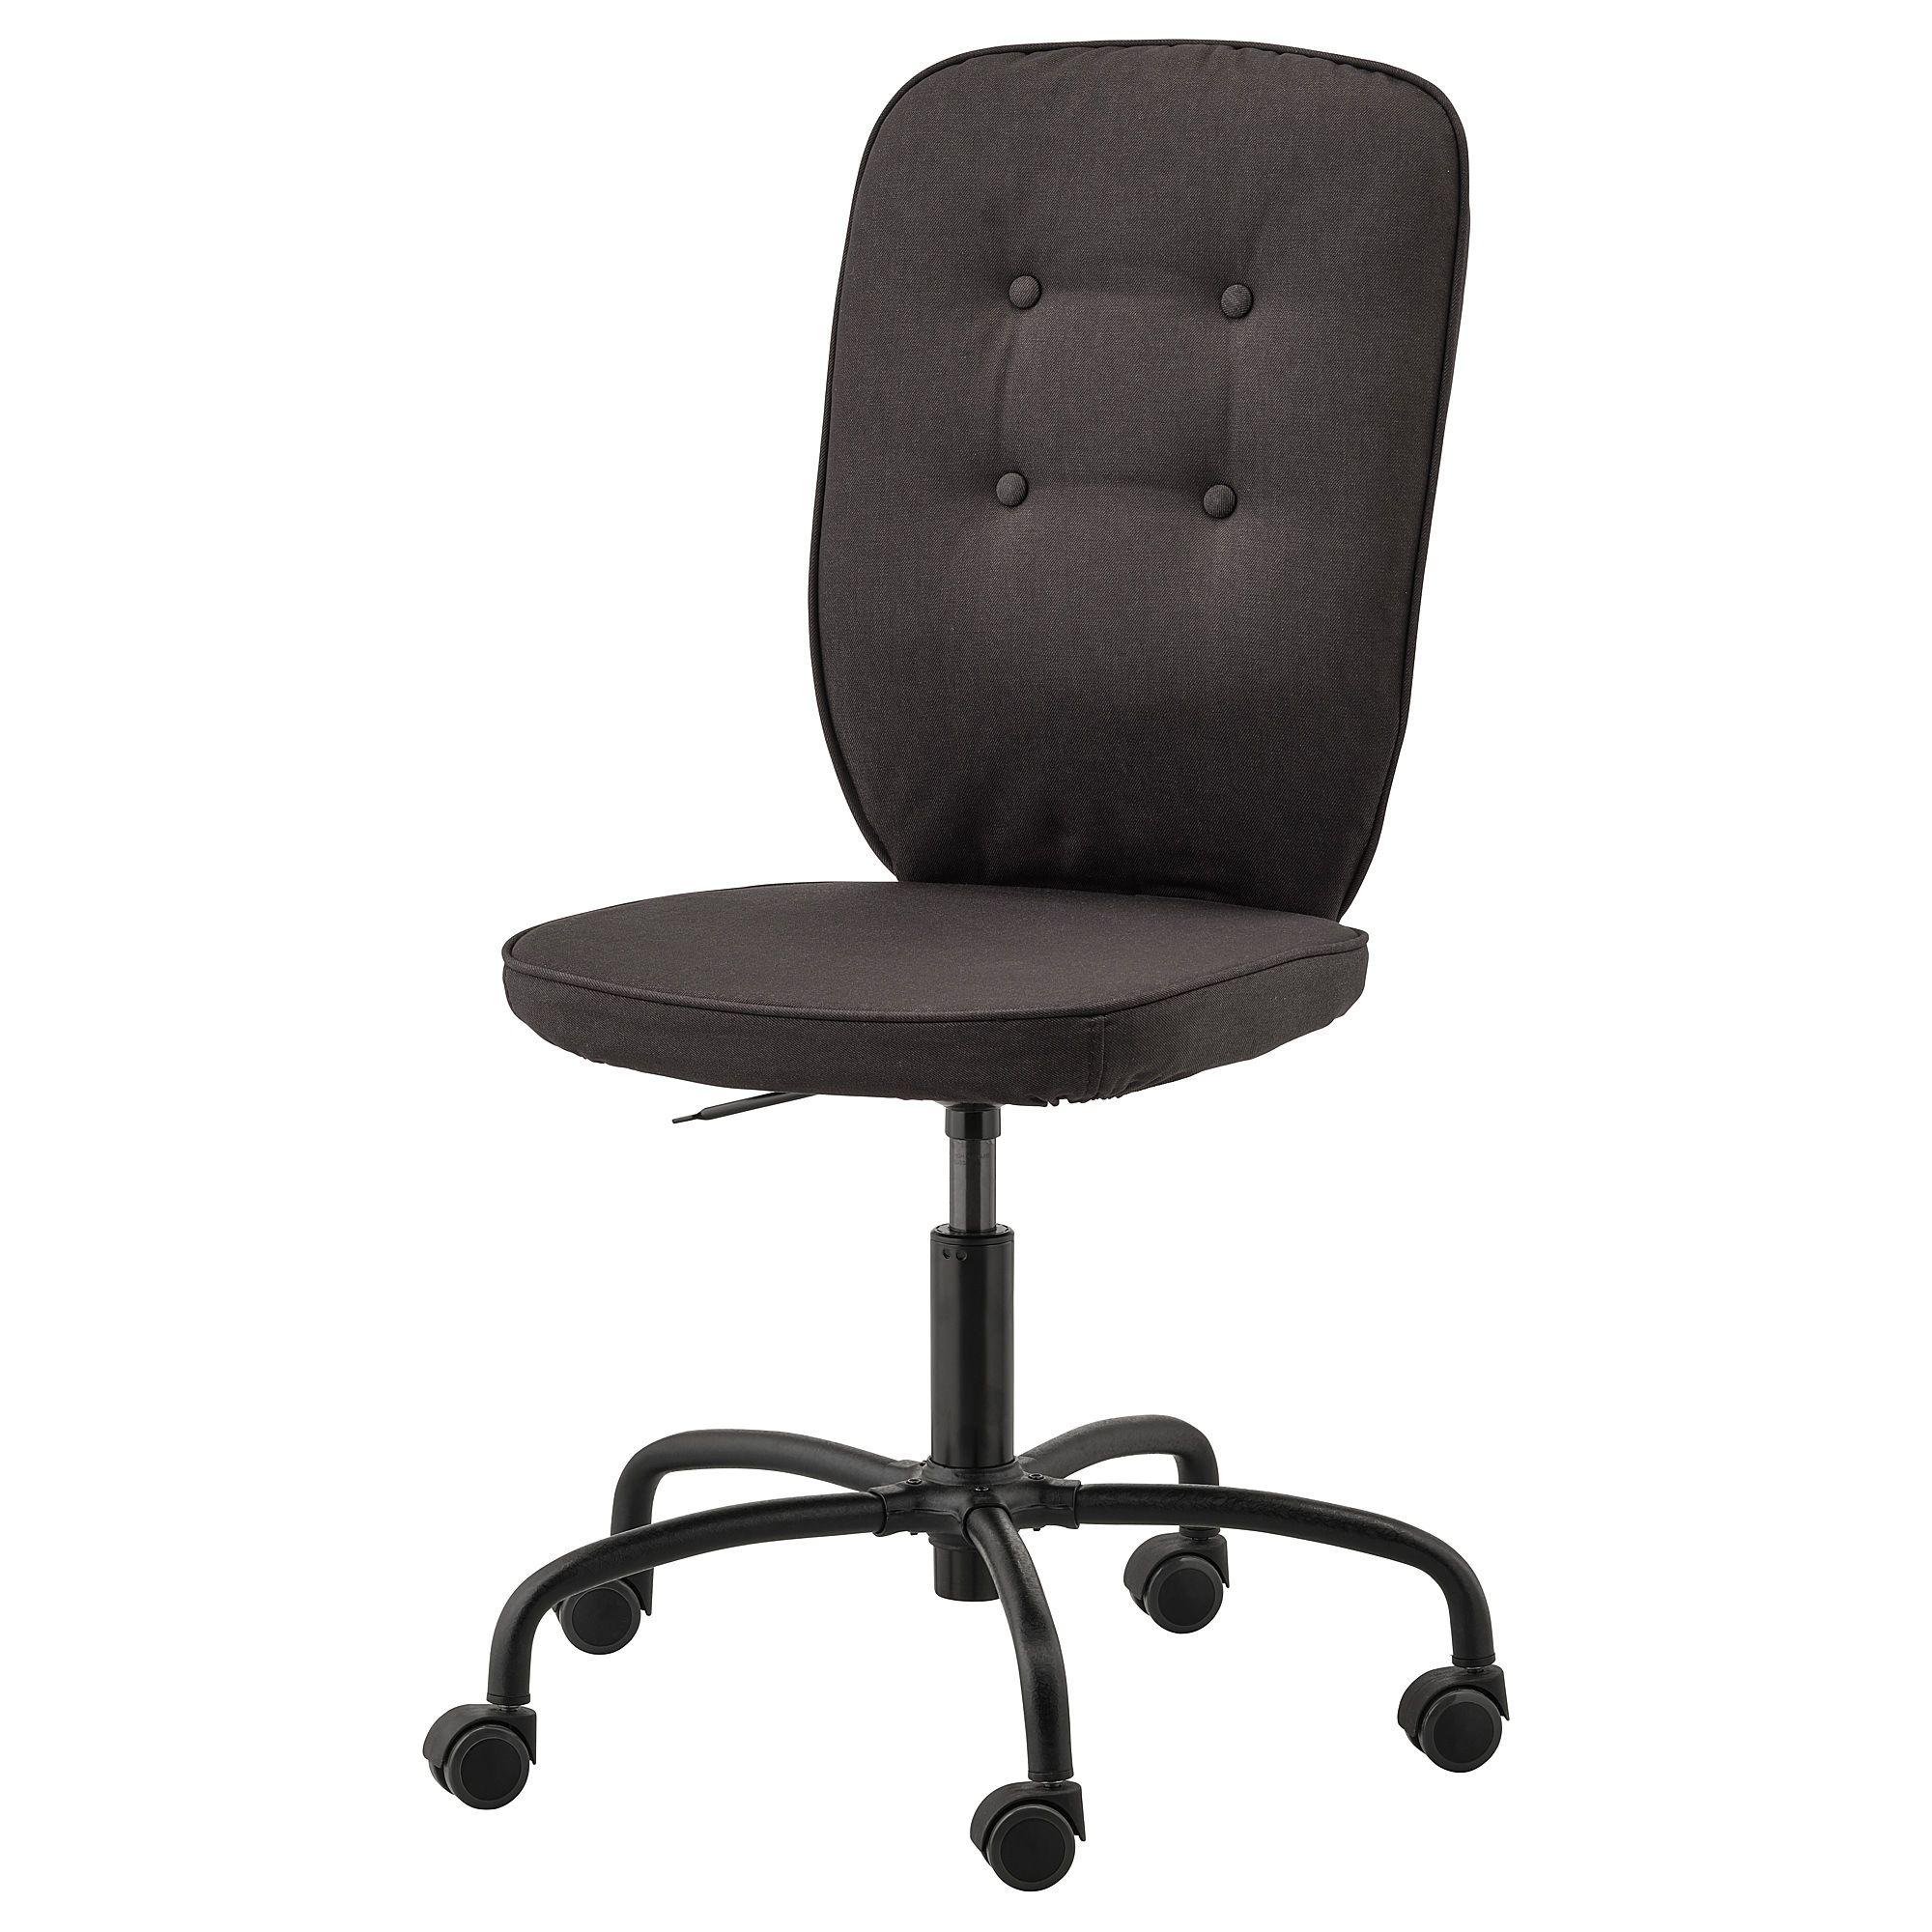 Ikea lillhojden idemo black black swivel chair swivel